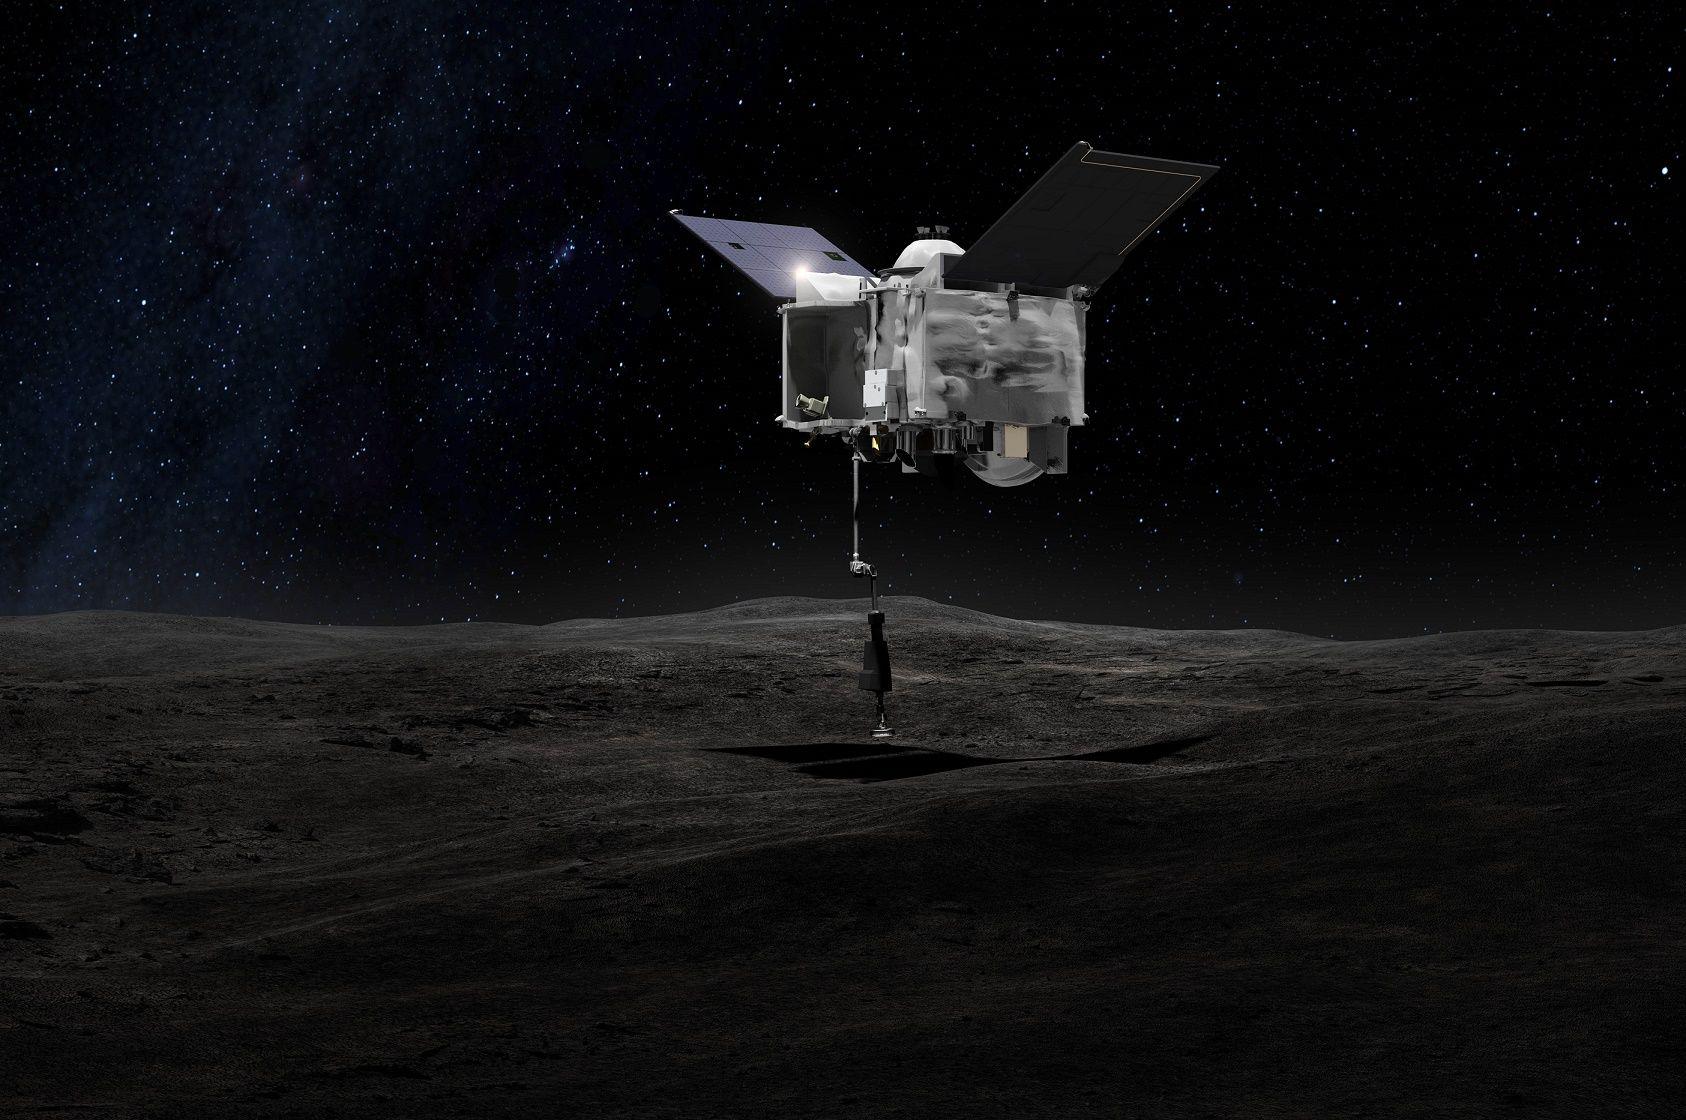 nasa asteroid mission space OSIRIS